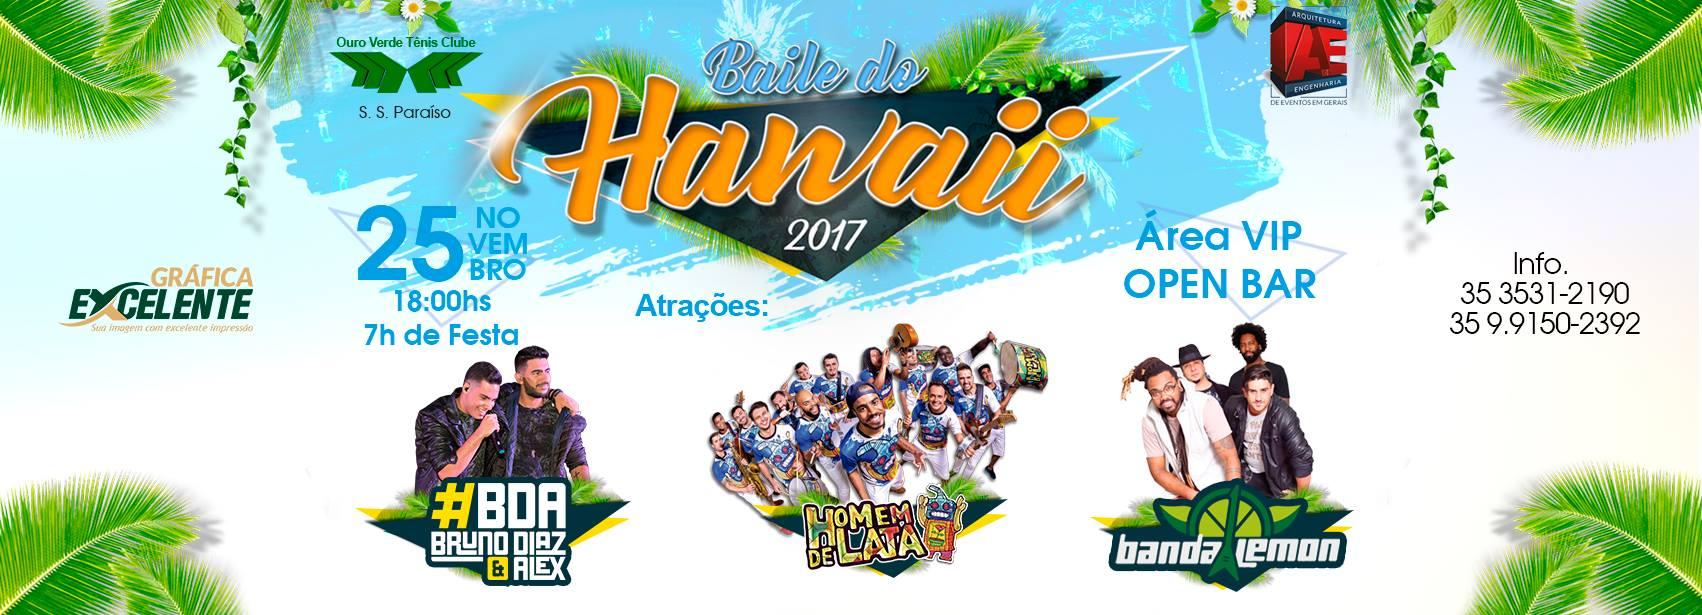 Ouro Verde - Baile do Hawaii 2017